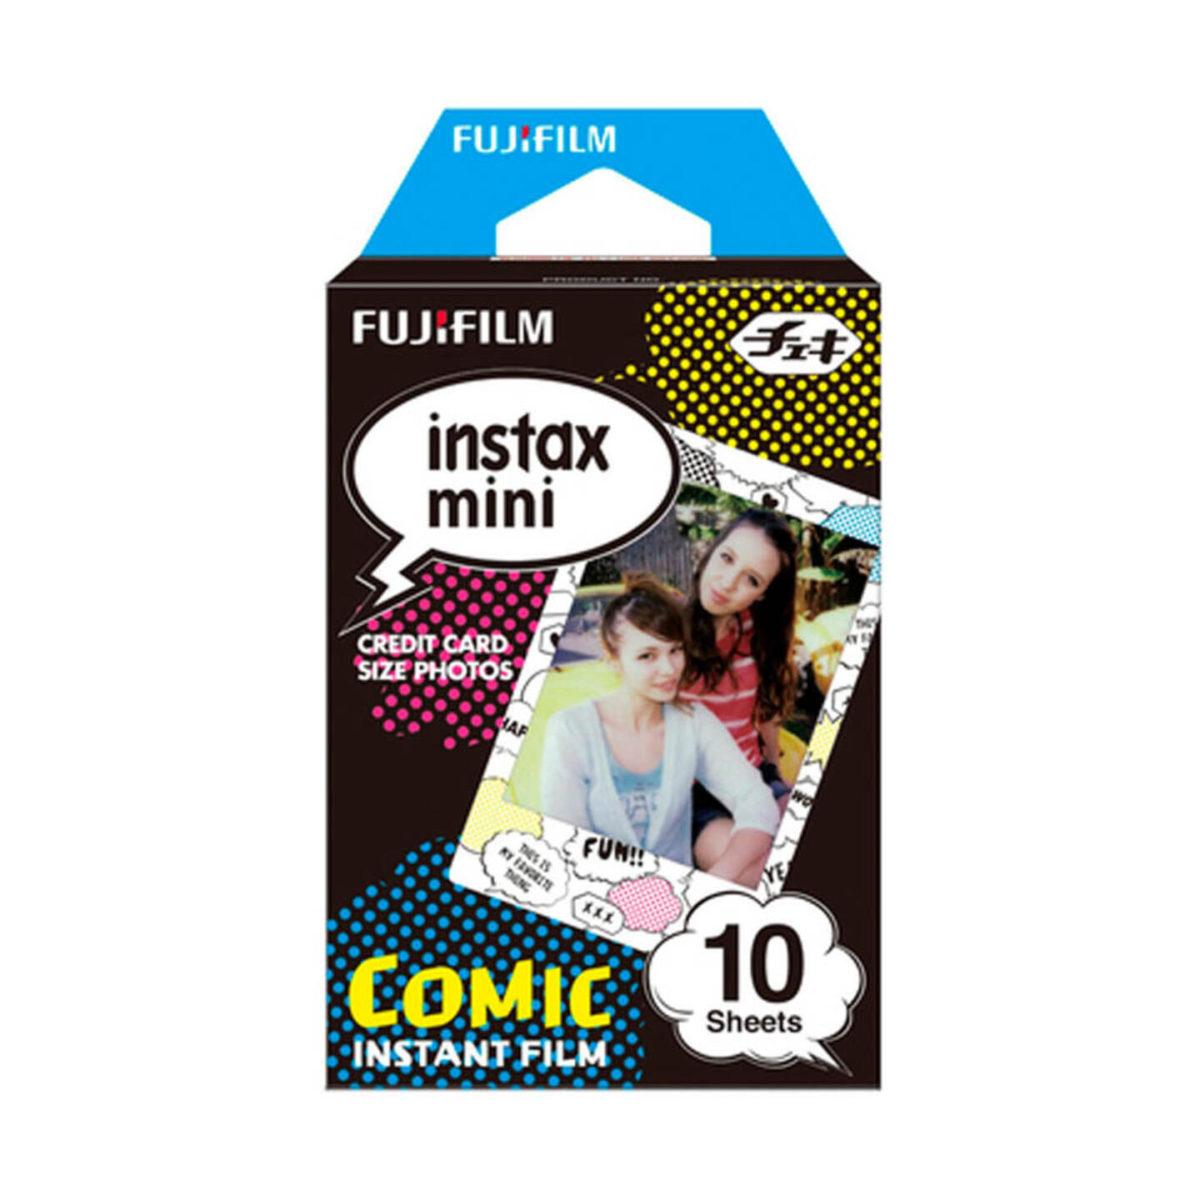 fujifilm_instax_mini_comic_01